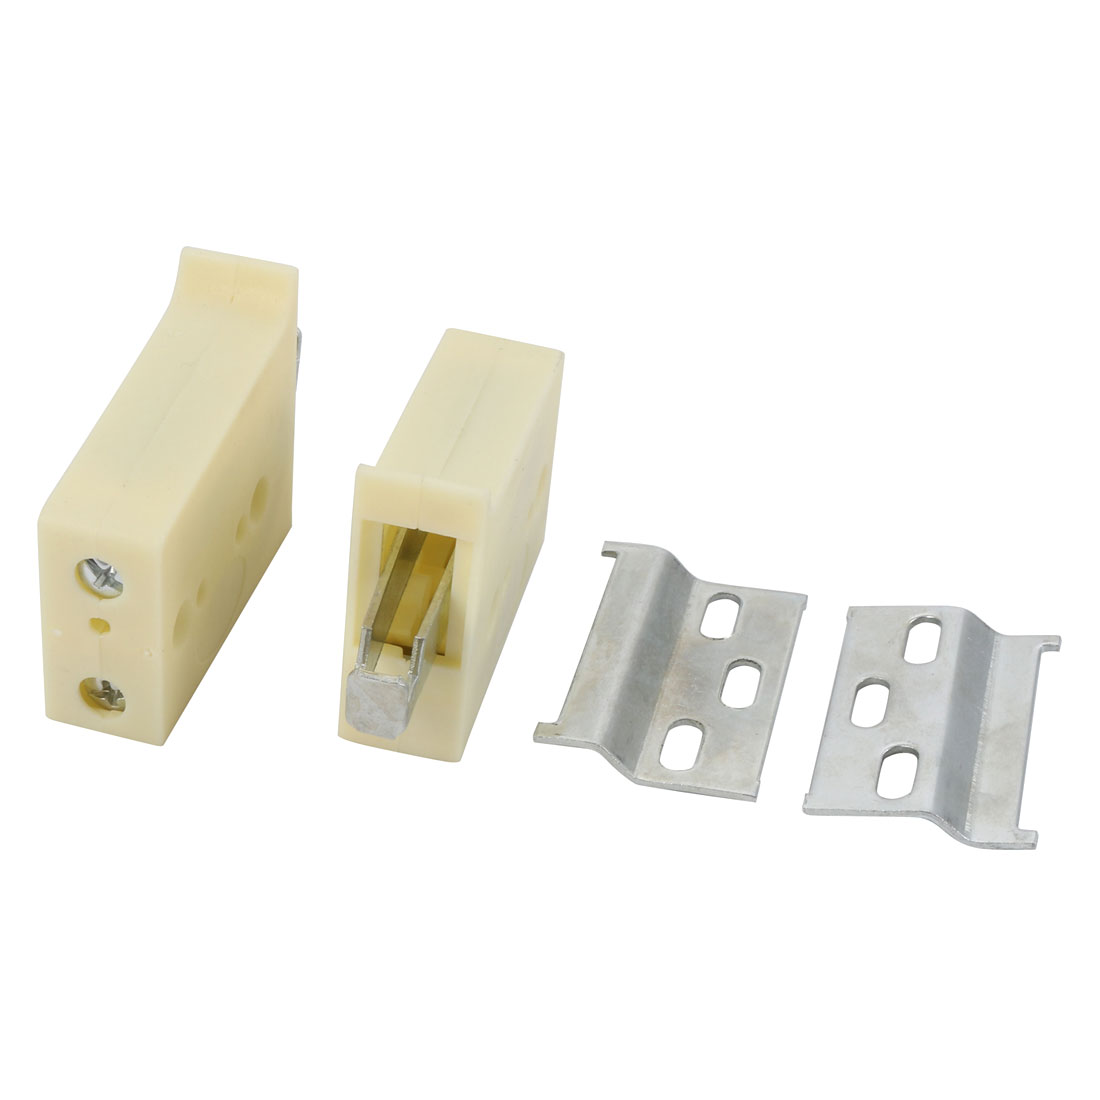 2Pcs Wall Mounted Shelves Storage Cabinet Adjustable Z-Clip Hanger